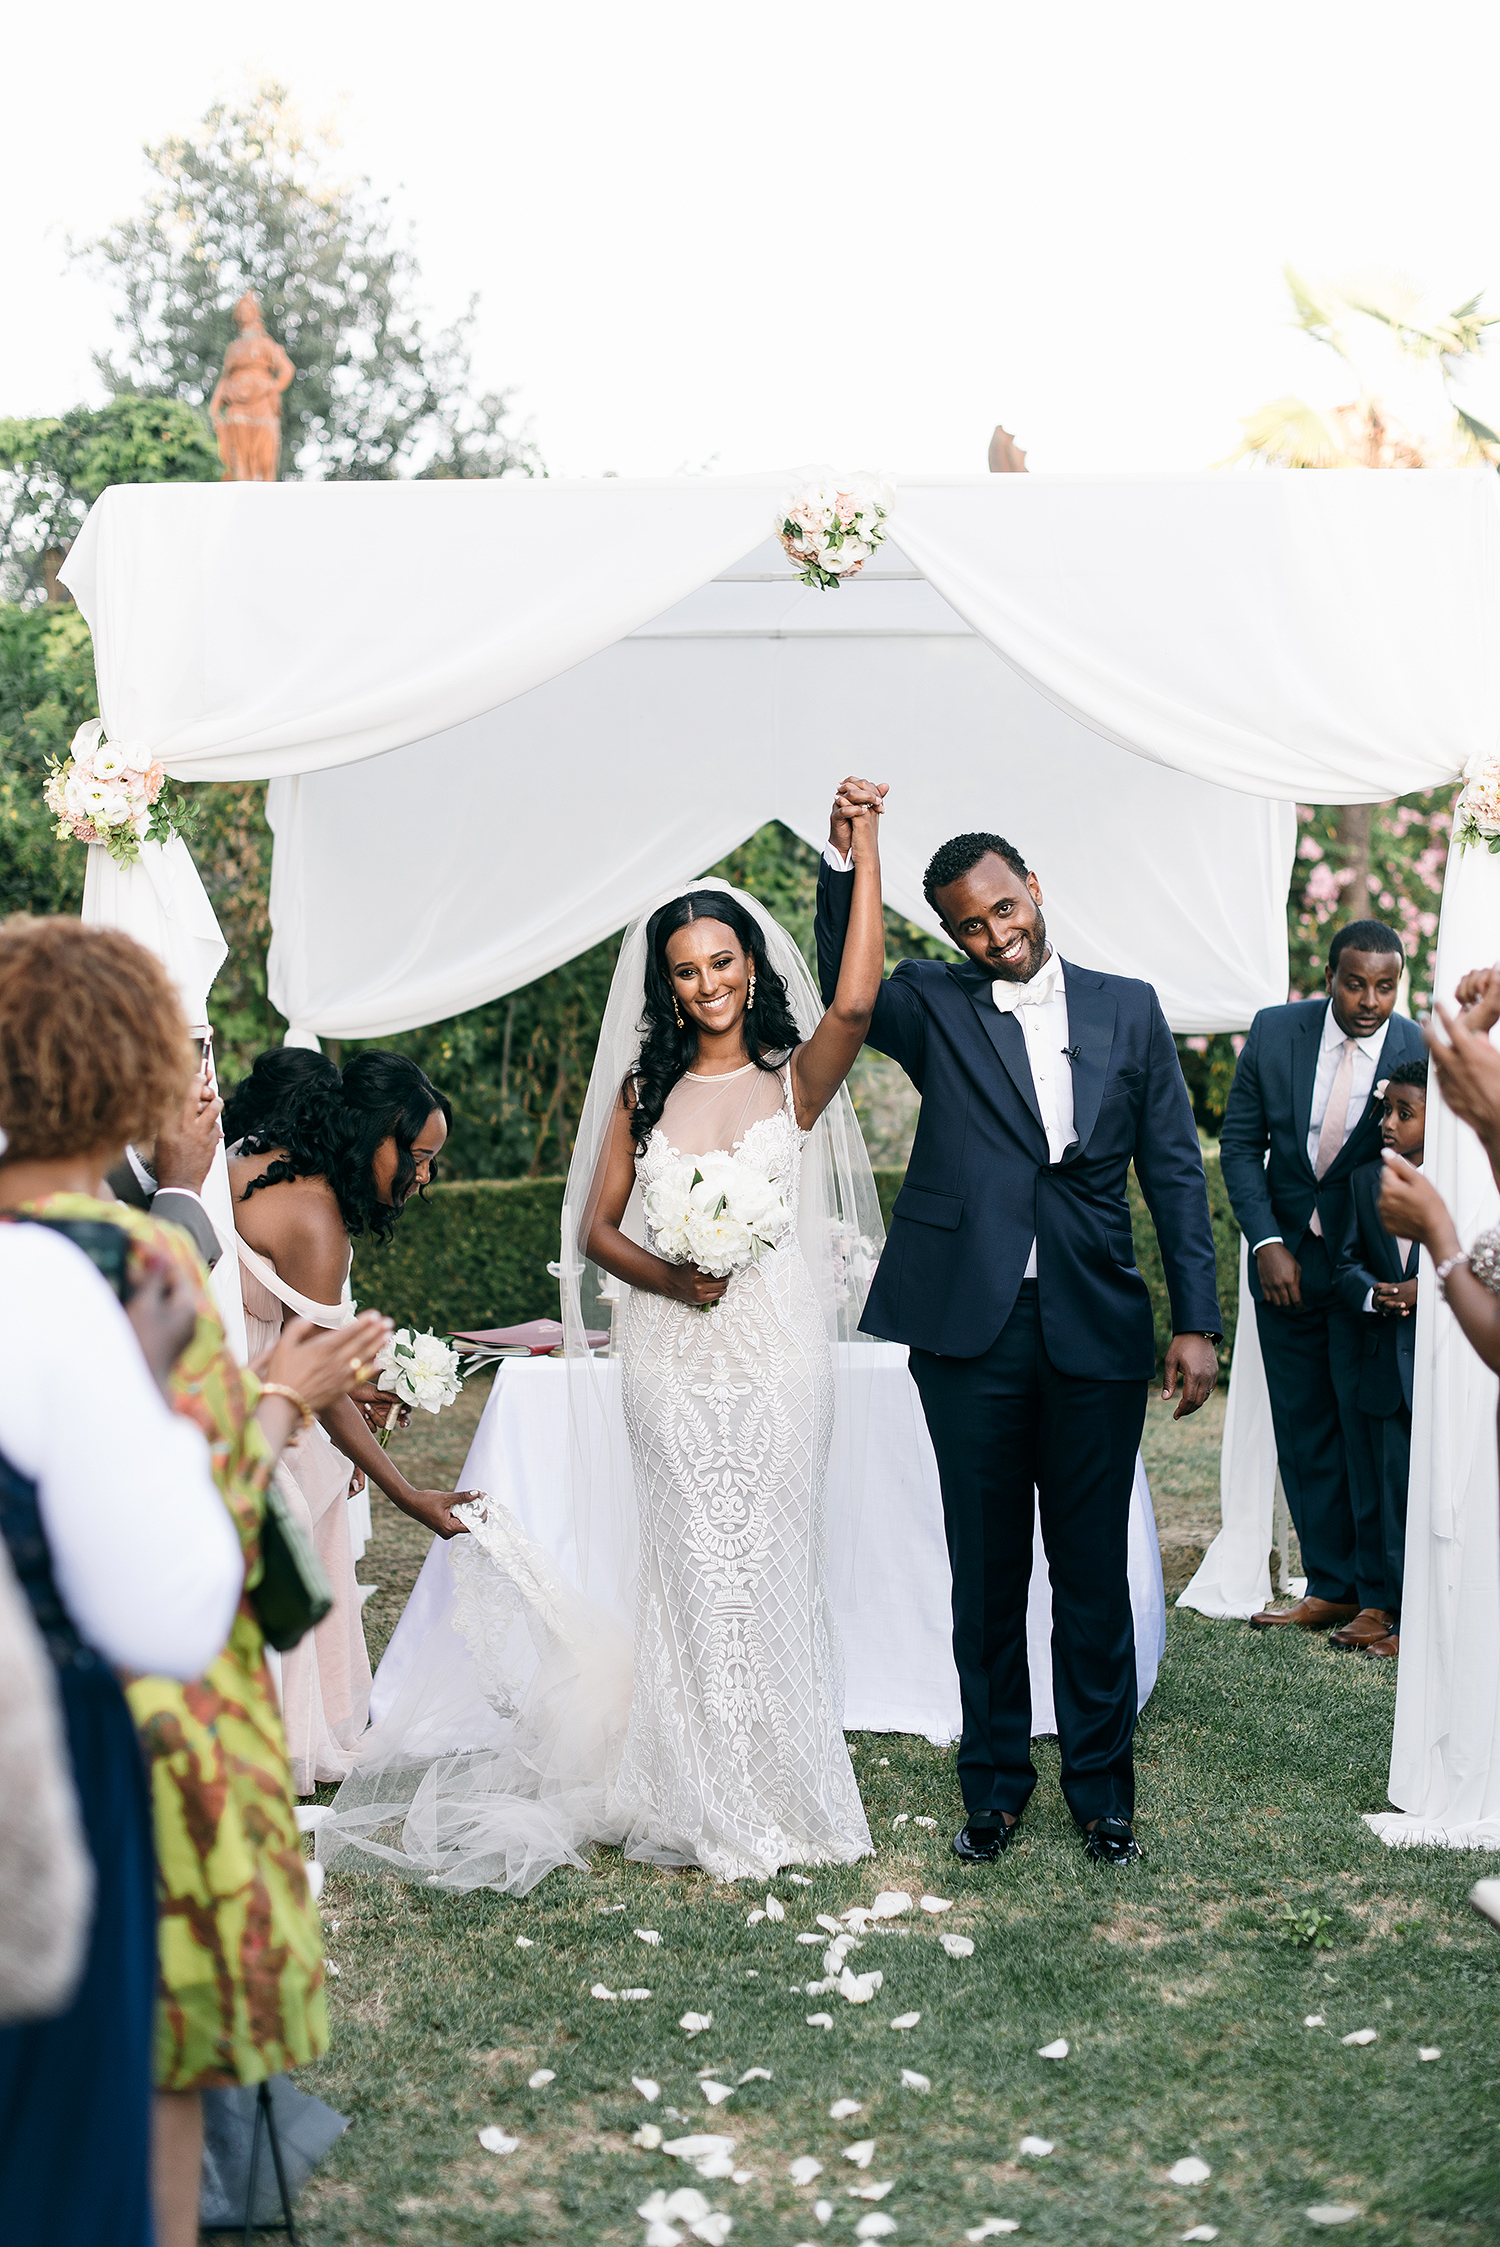 veronica mickias wedding bride and groom pronouncement